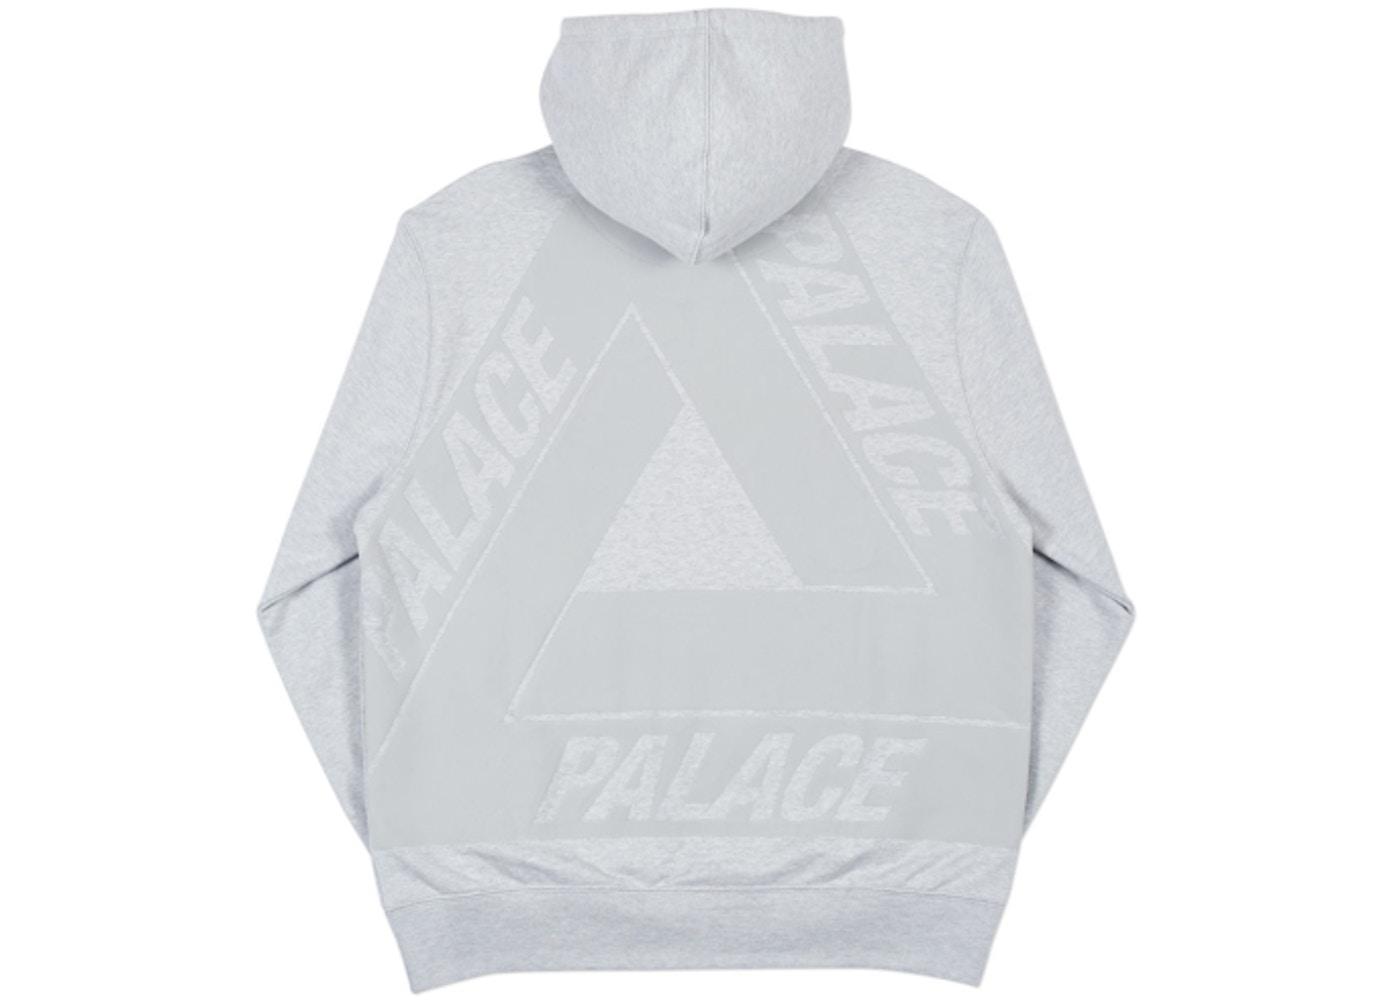 af7165a371b8 Palace Jumbo Ferg Hood Grey Marl - Spring 2018